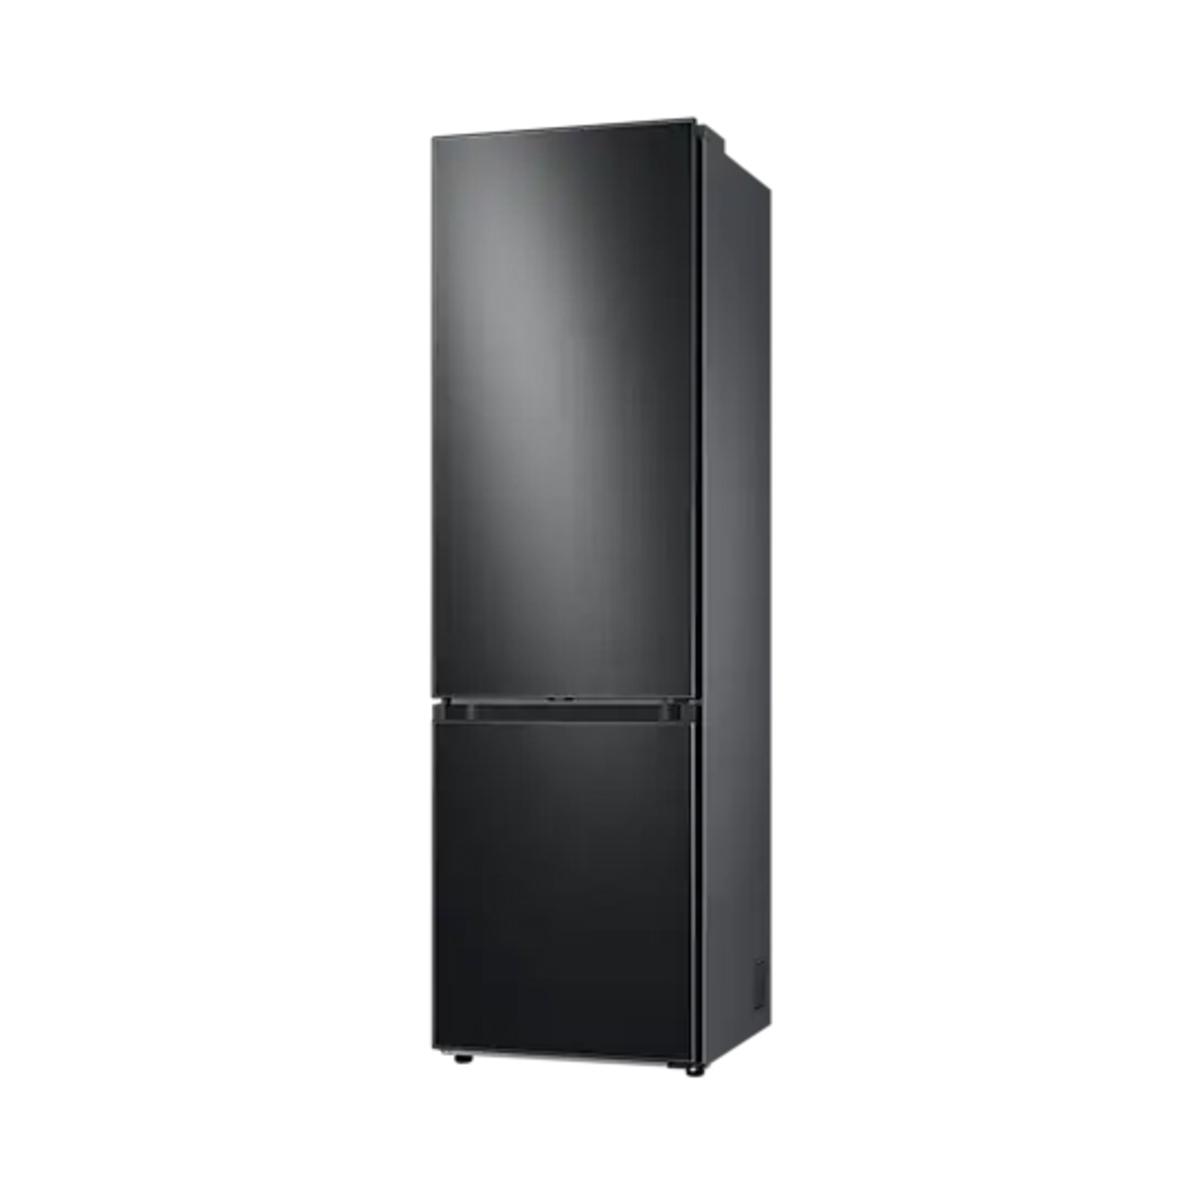 Samsung RB38A7B6BB1/EU Bespoke 2.03m Fridge Freezer, Black Stainless